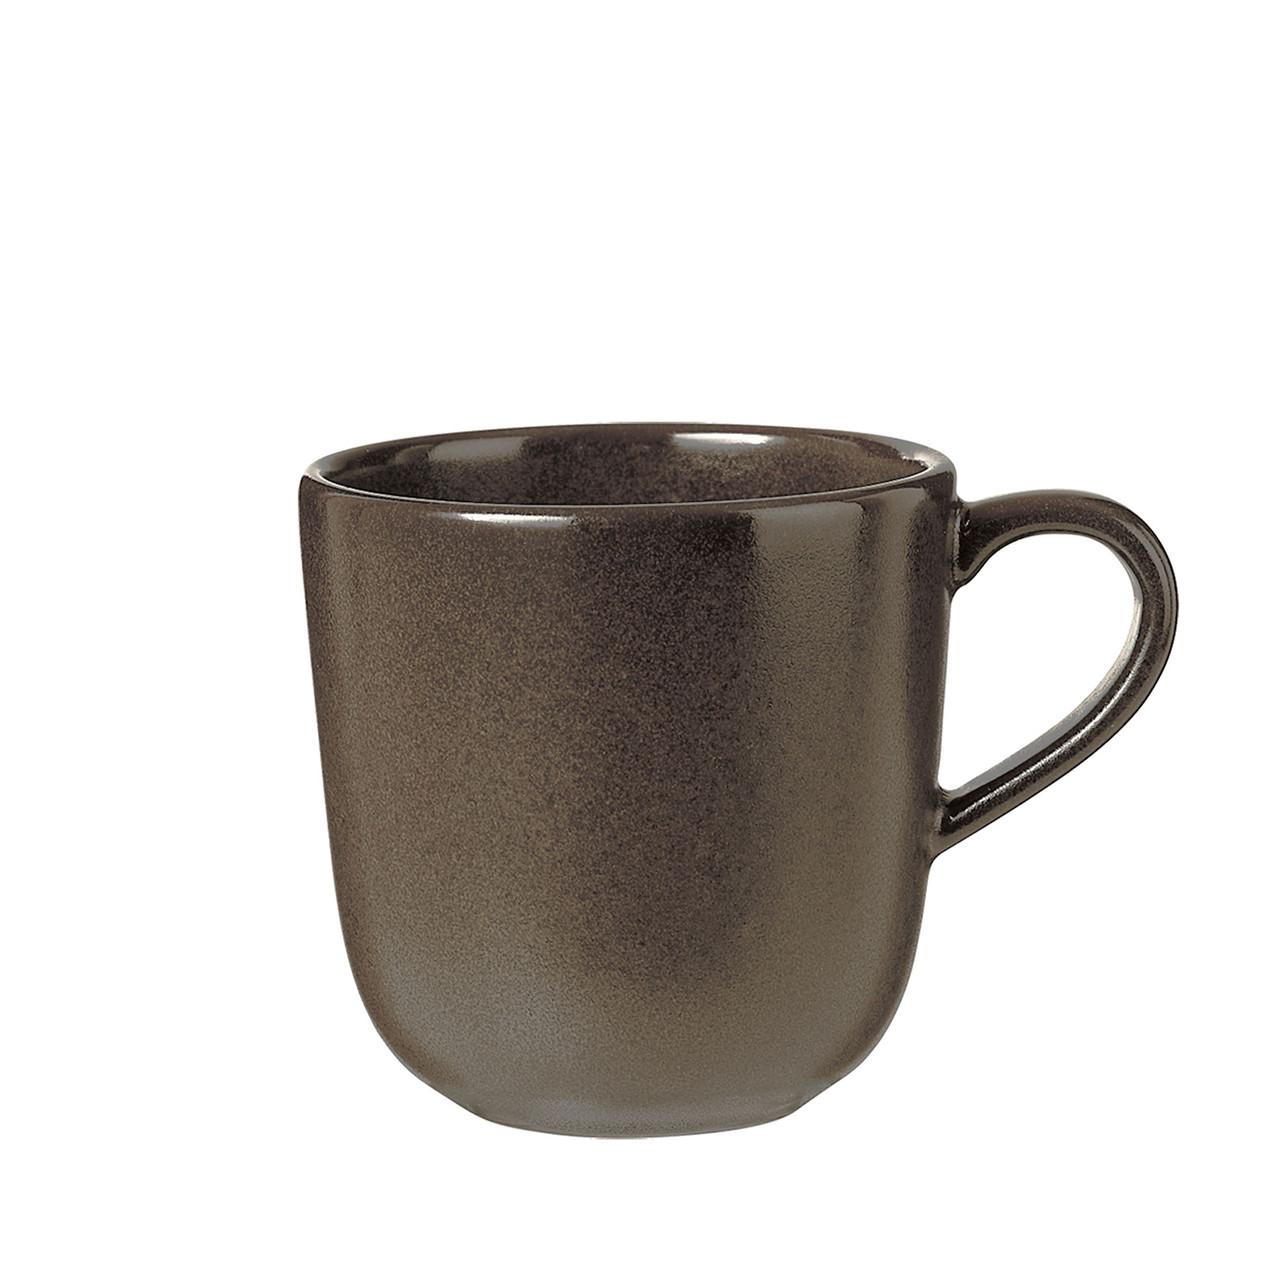 Billede af AIDA RAW kaffekop metallic brown